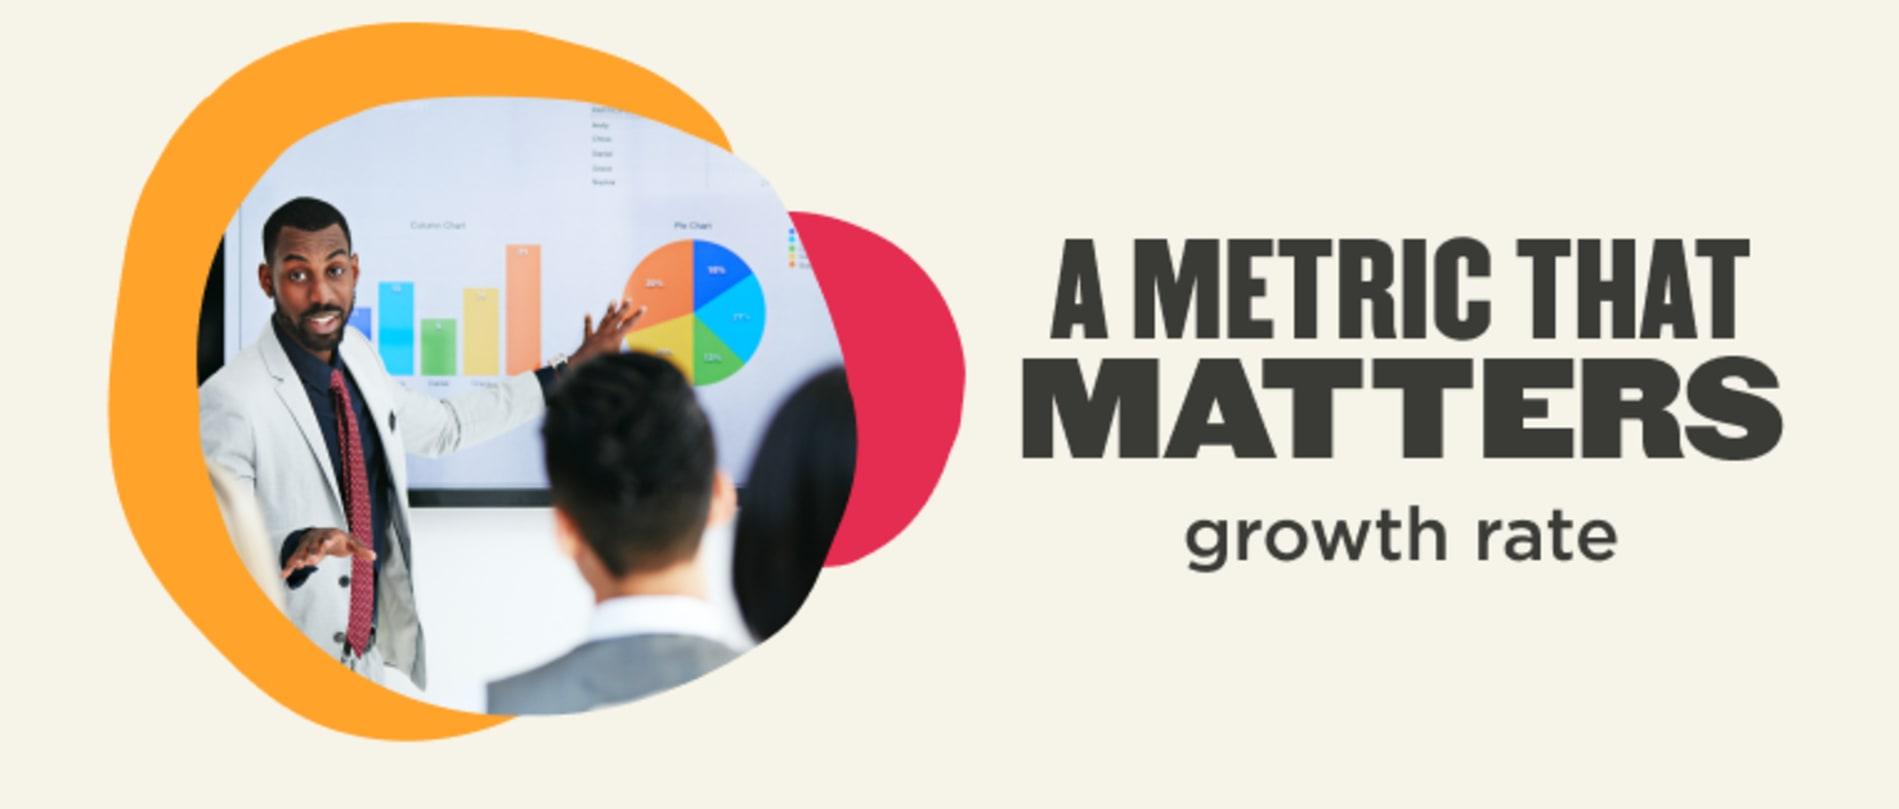 HR metrics that matter: employee growth rate - A-metric-that-matters-growth-rate-Blog-post.png